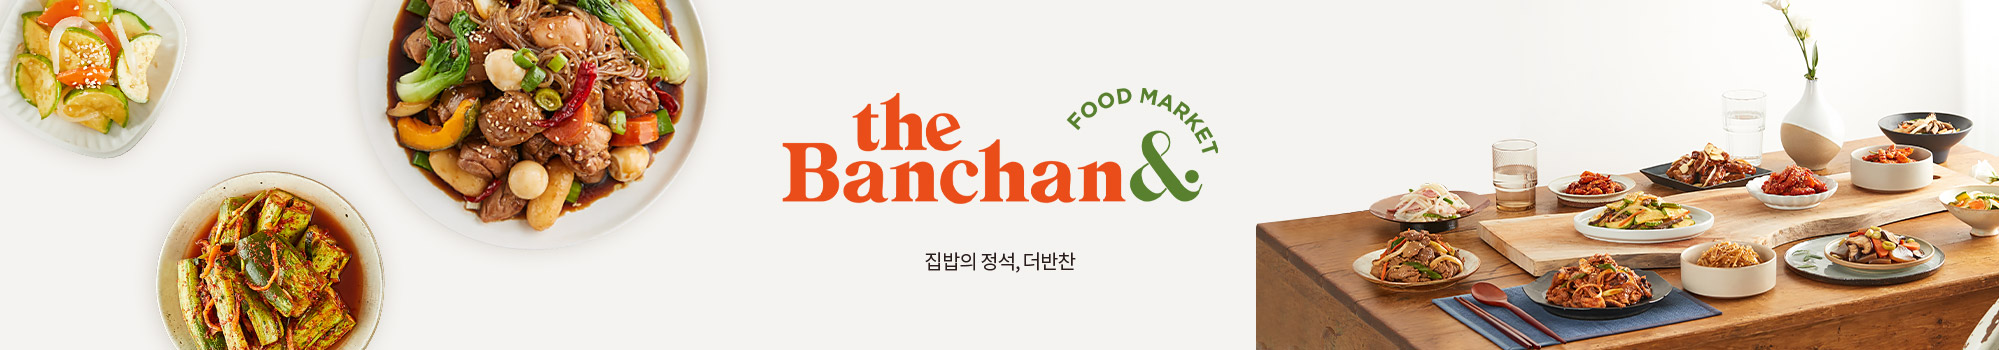 theBanchan